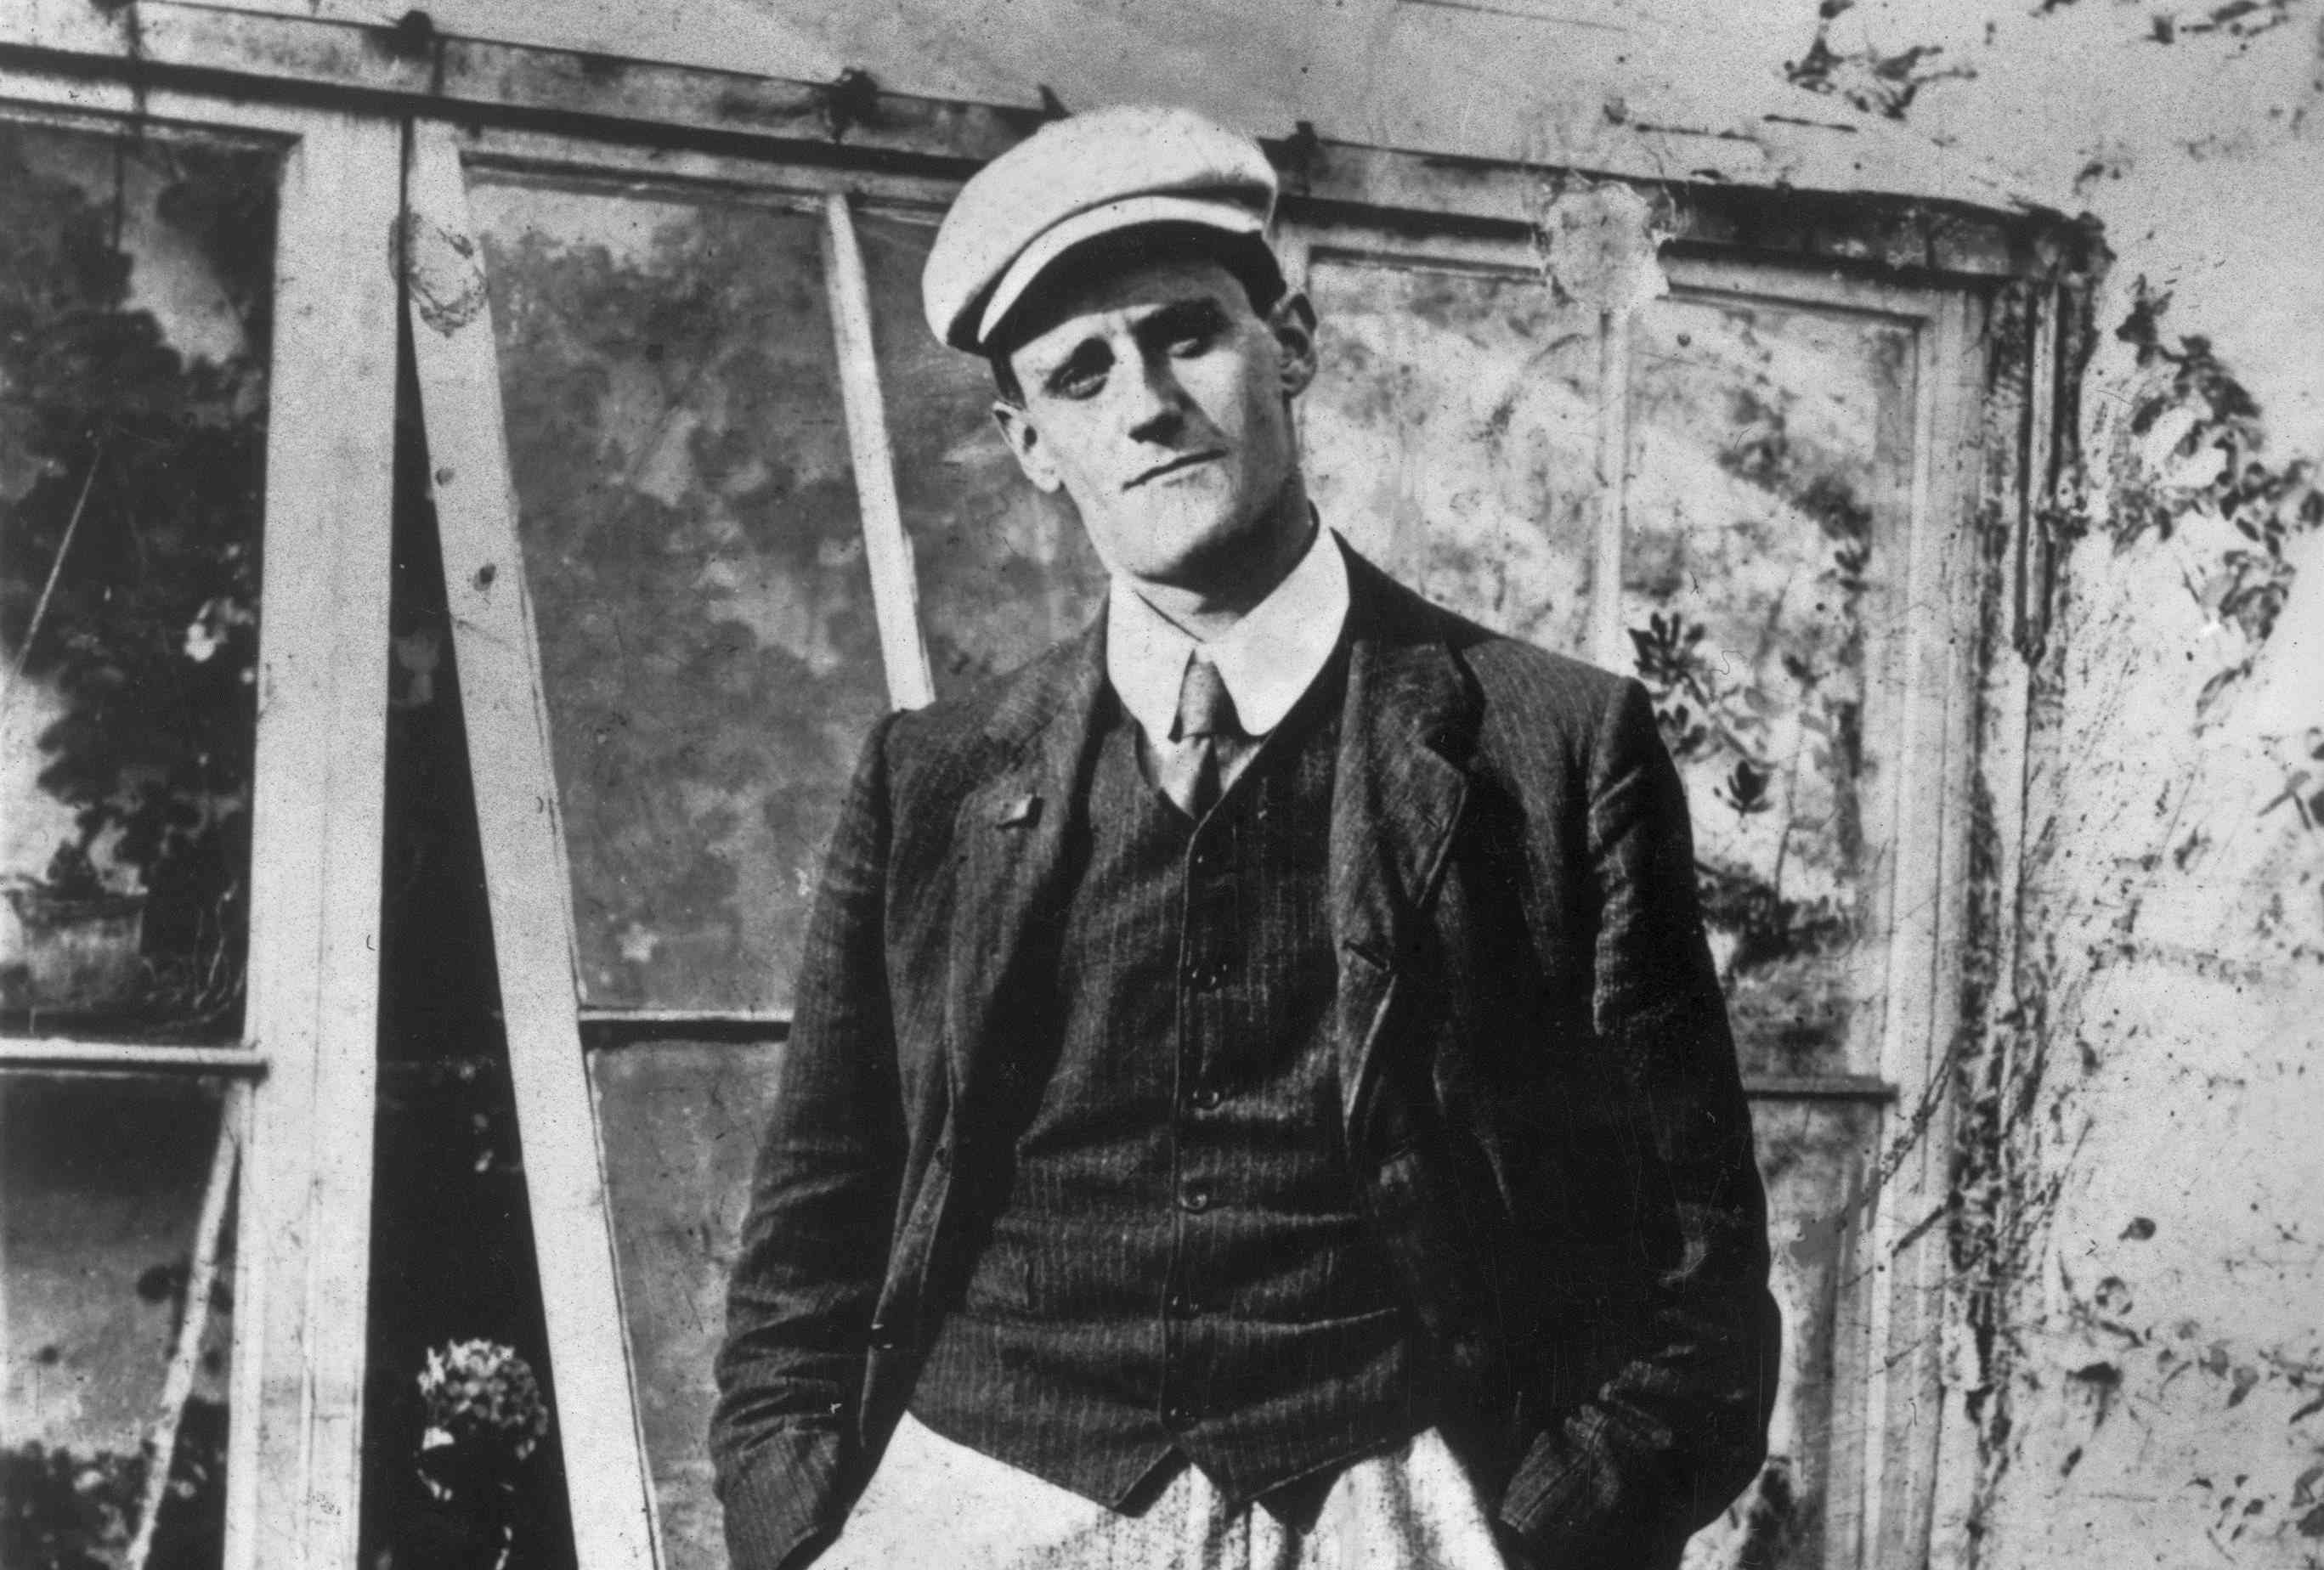 photograph of young James Joyce